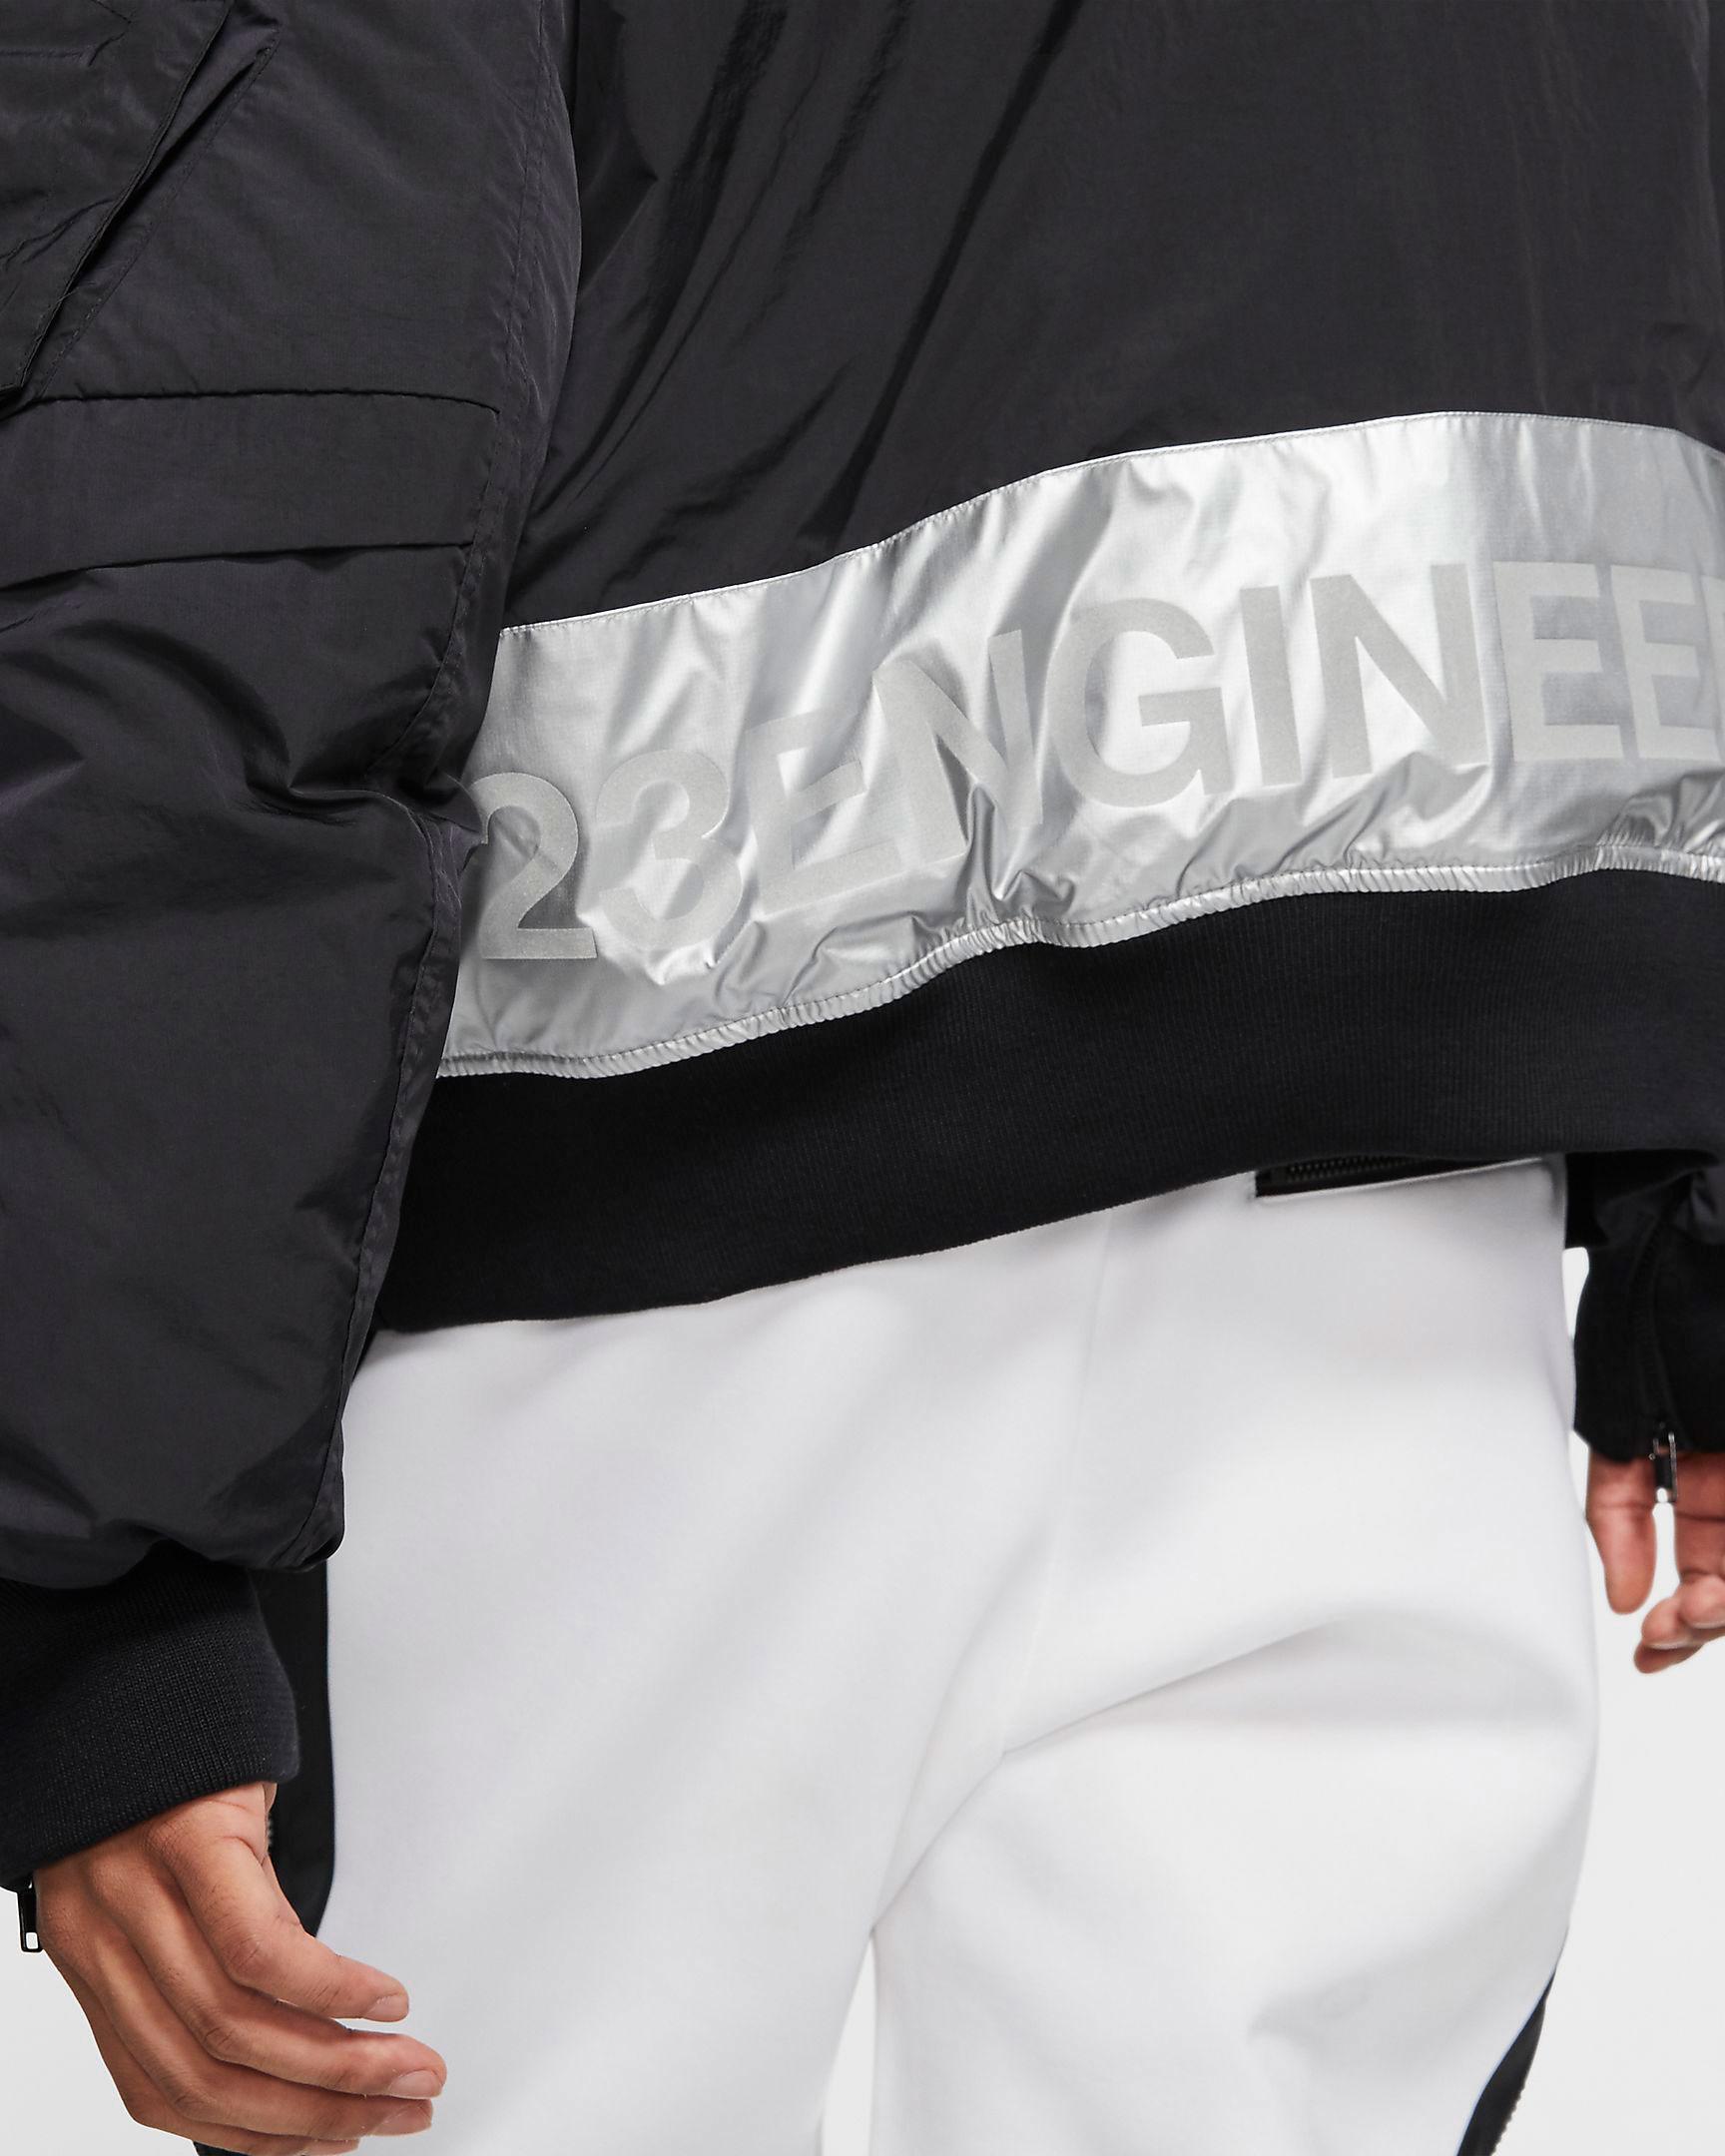 jordan-23-engineered-ma1-down-jacket-black-silver-8